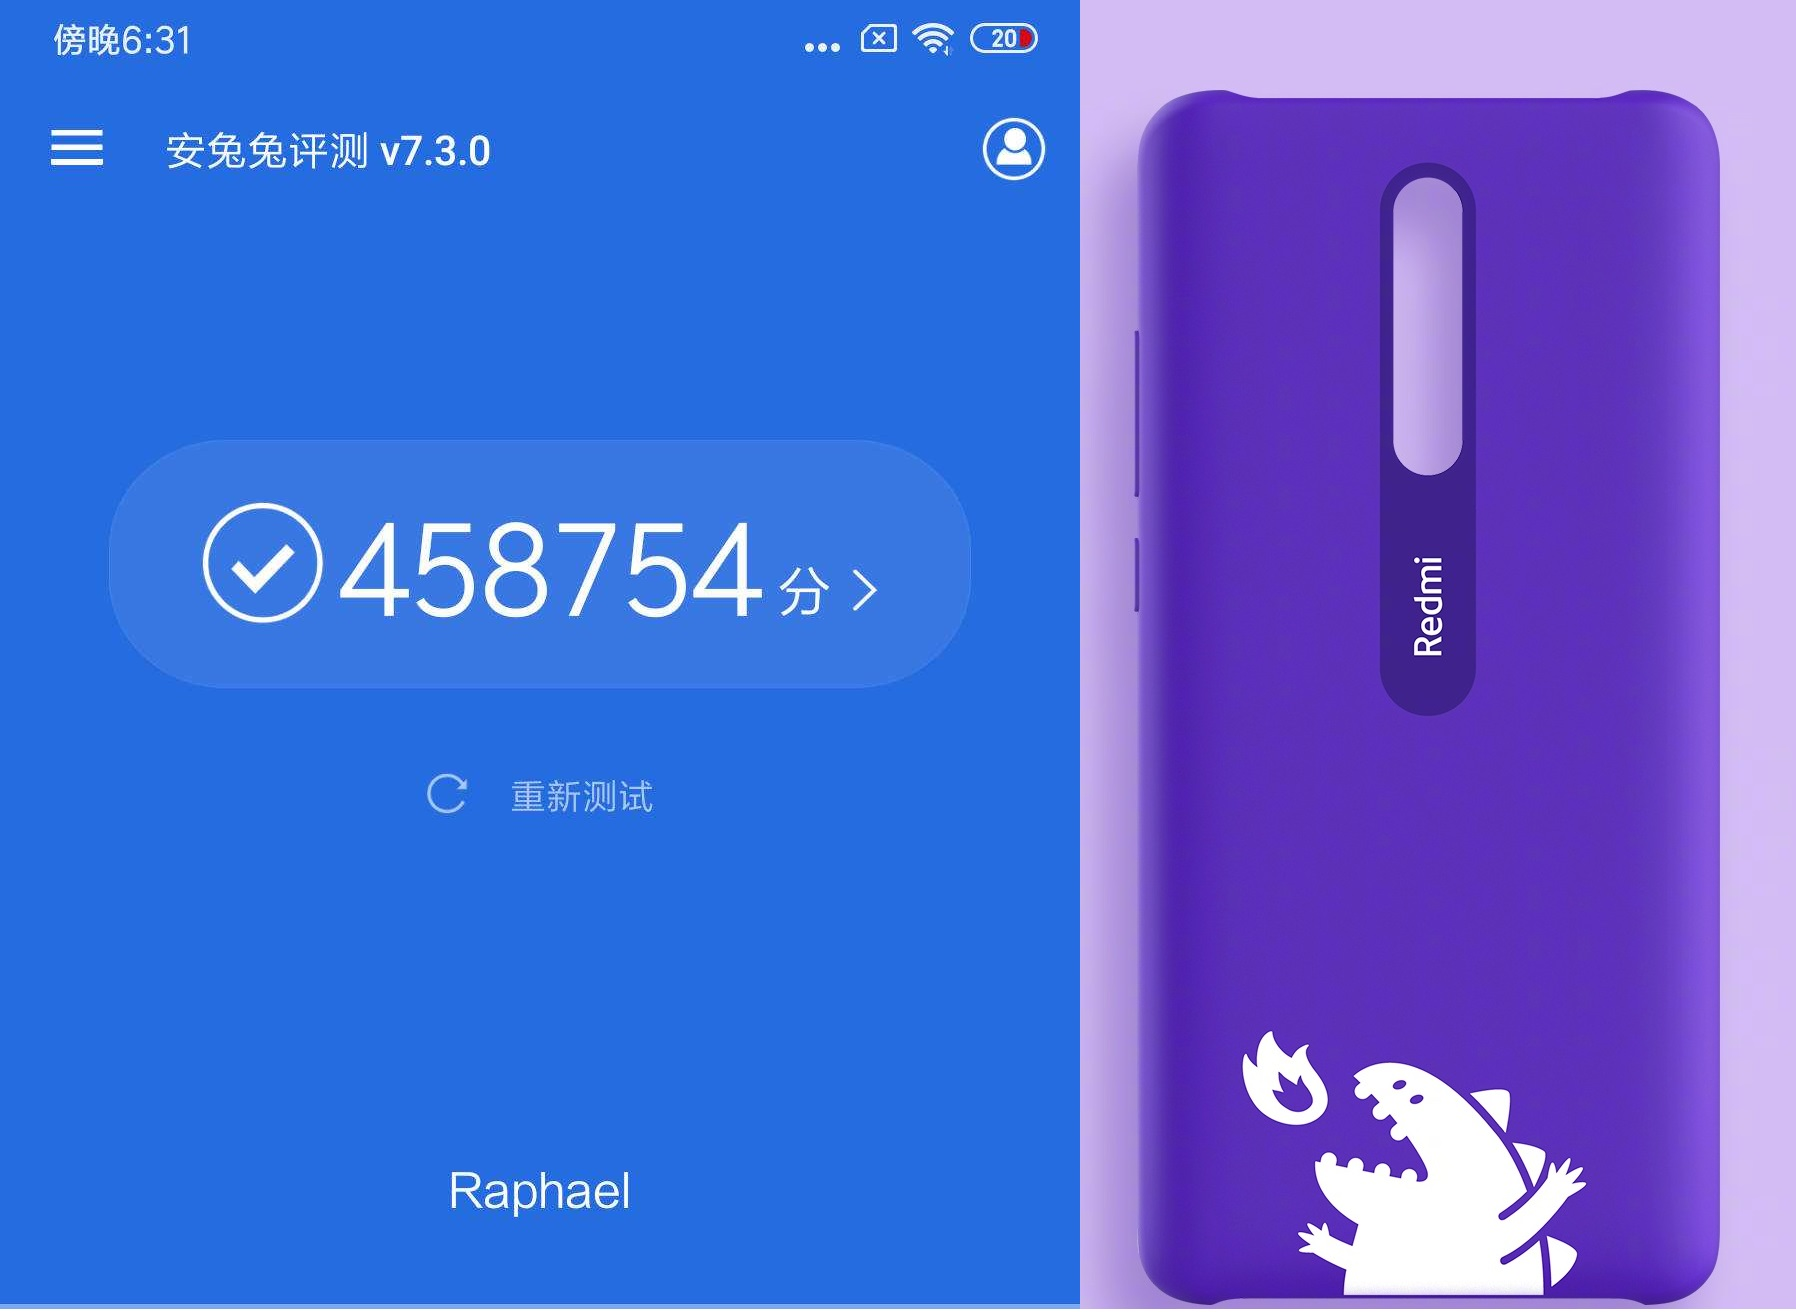 كل ما نعرفه عن أول هواتف Redmi الرائدة هاتف Redmi K20